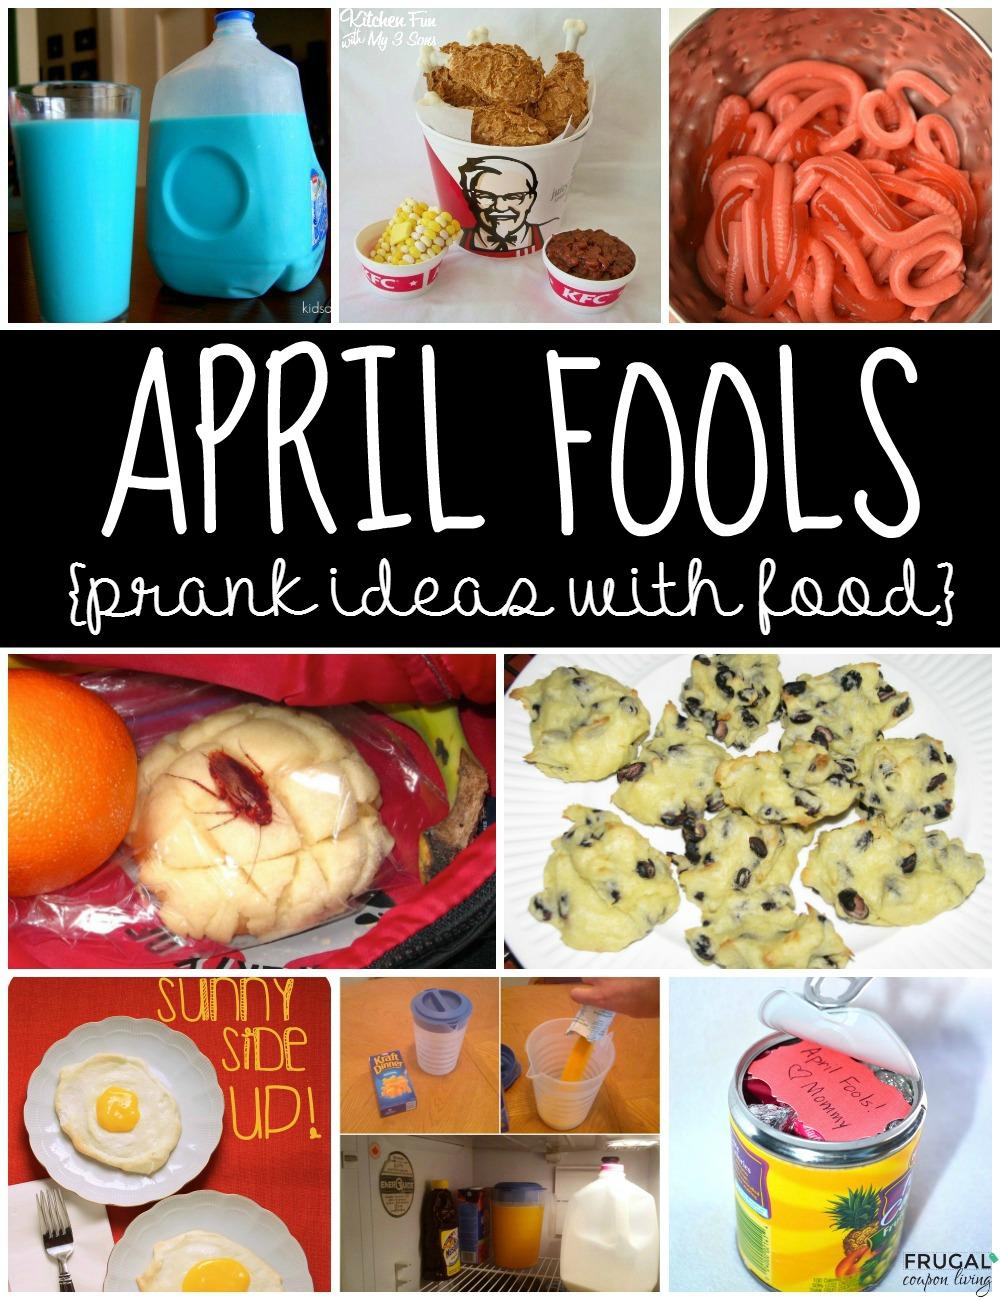 april-fools-pranks-ideas-collage-food-frugal-coupon-living